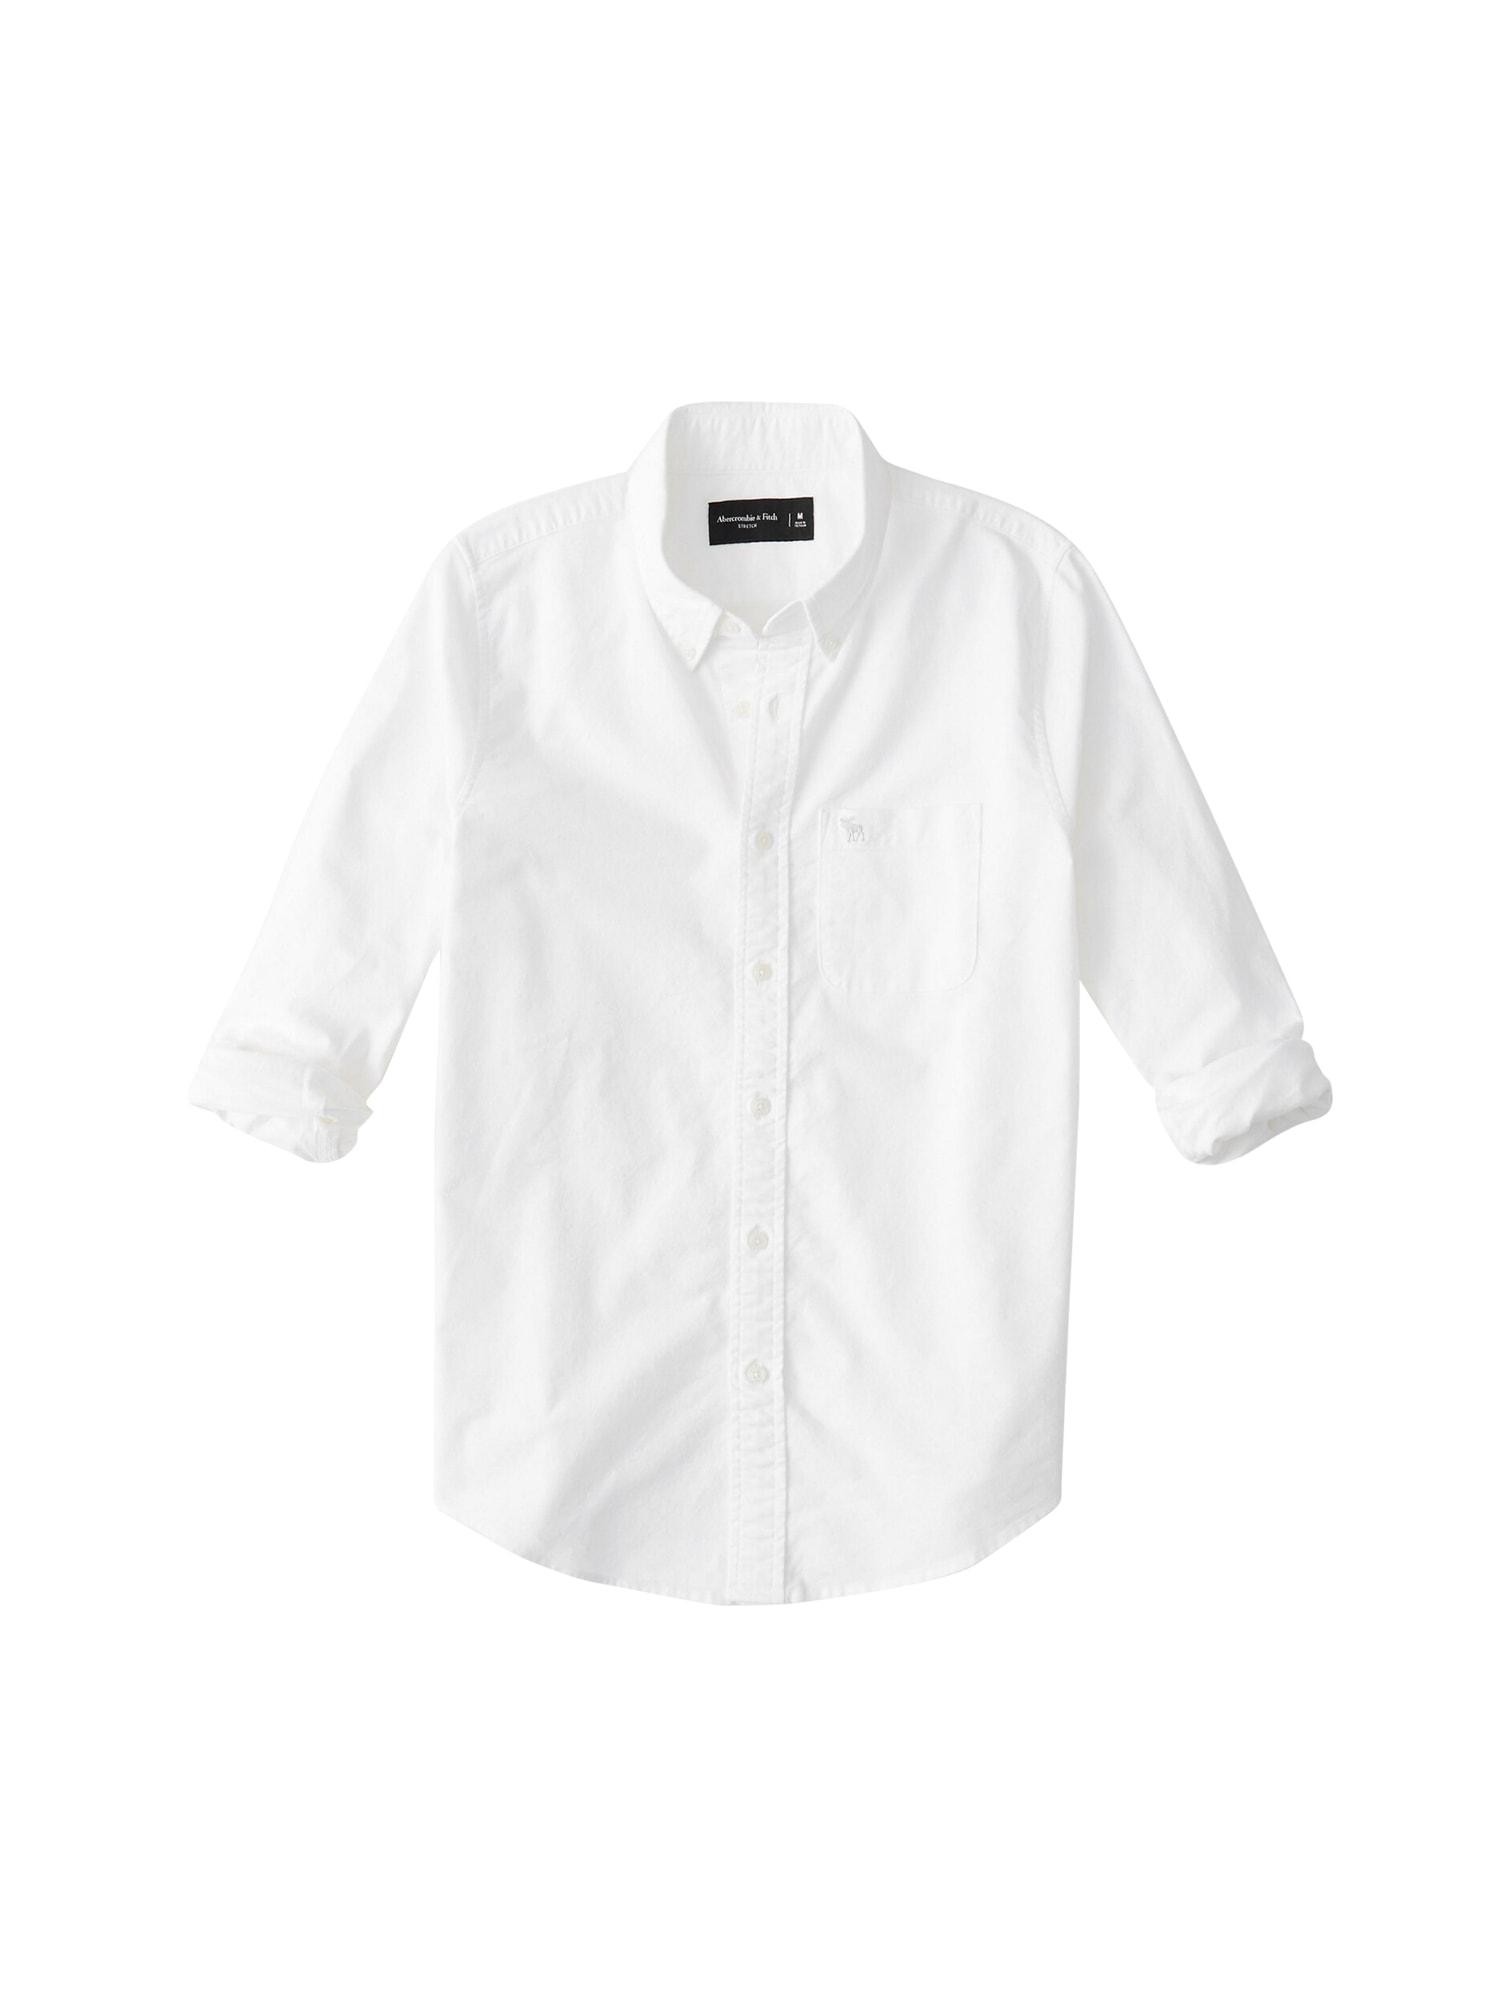 Abercrombie & Fitch Dalykiniai marškiniai 'ICON CORE OXFORD' balta